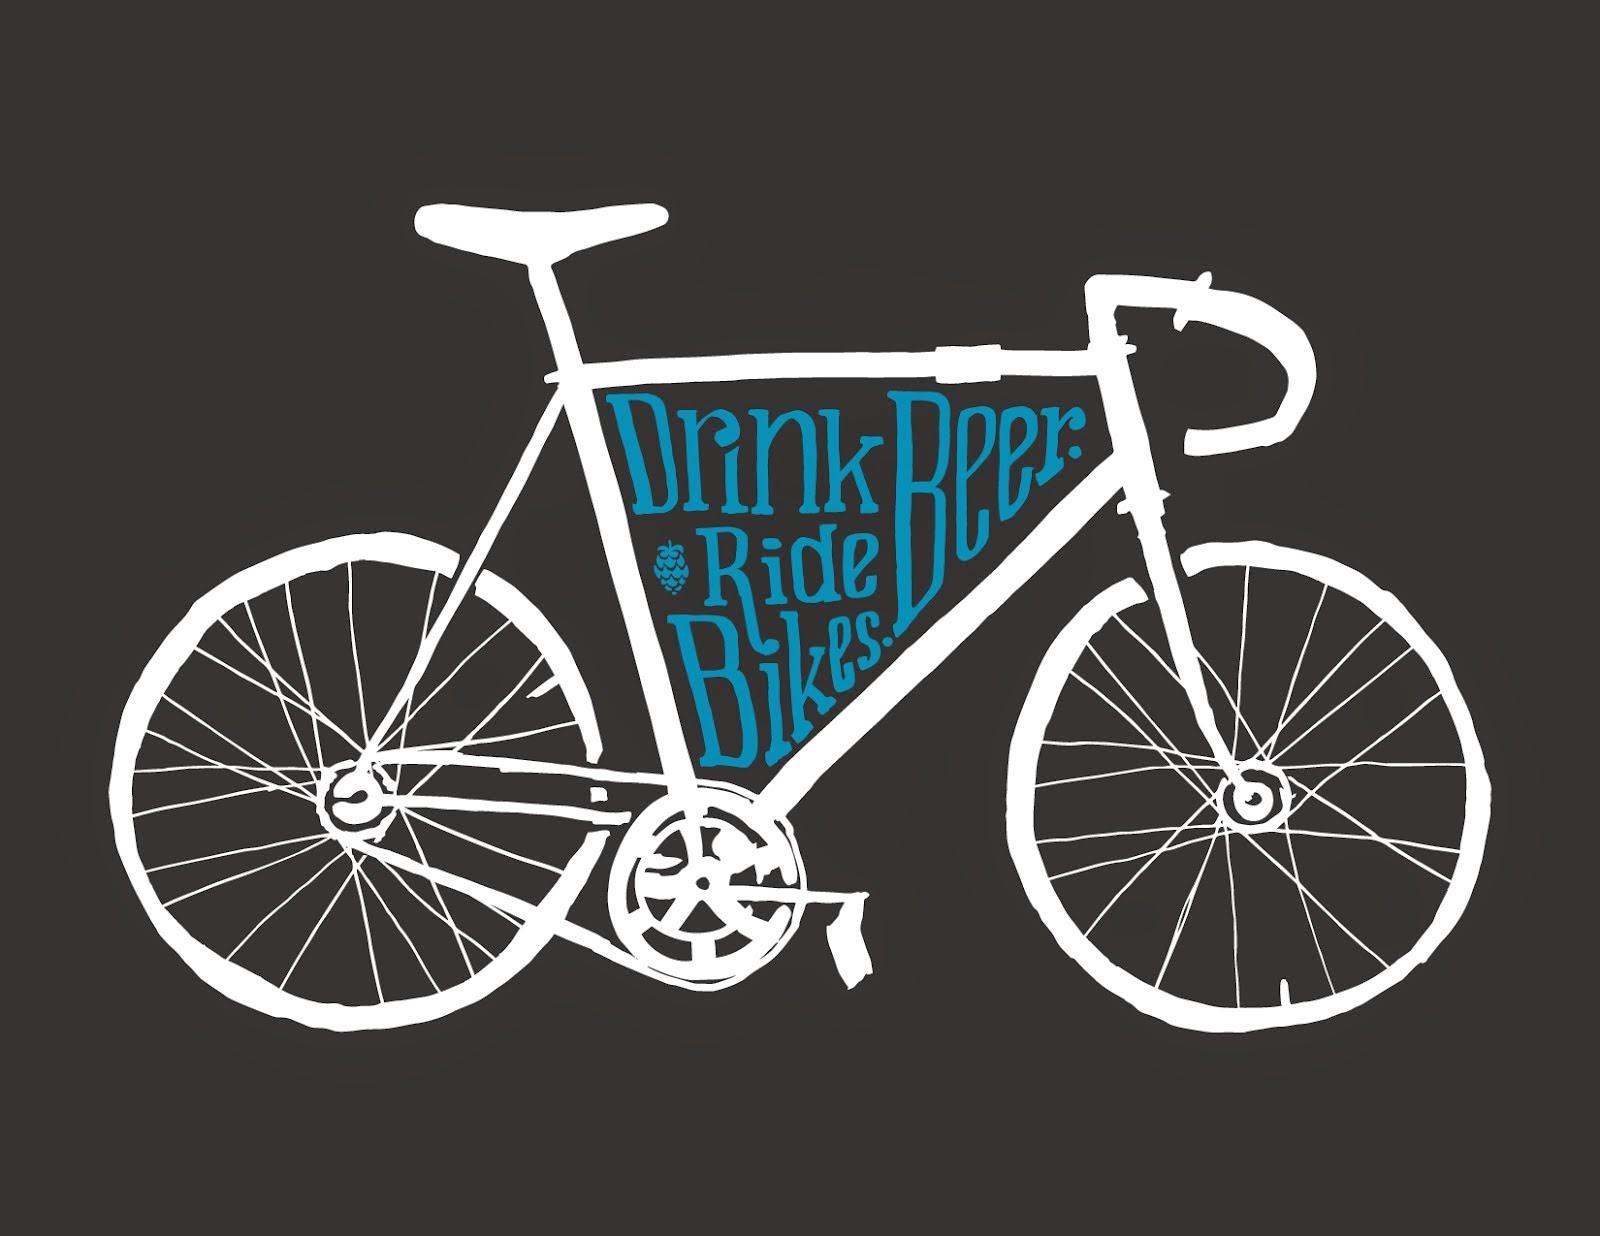 #drinkbeerridebikes